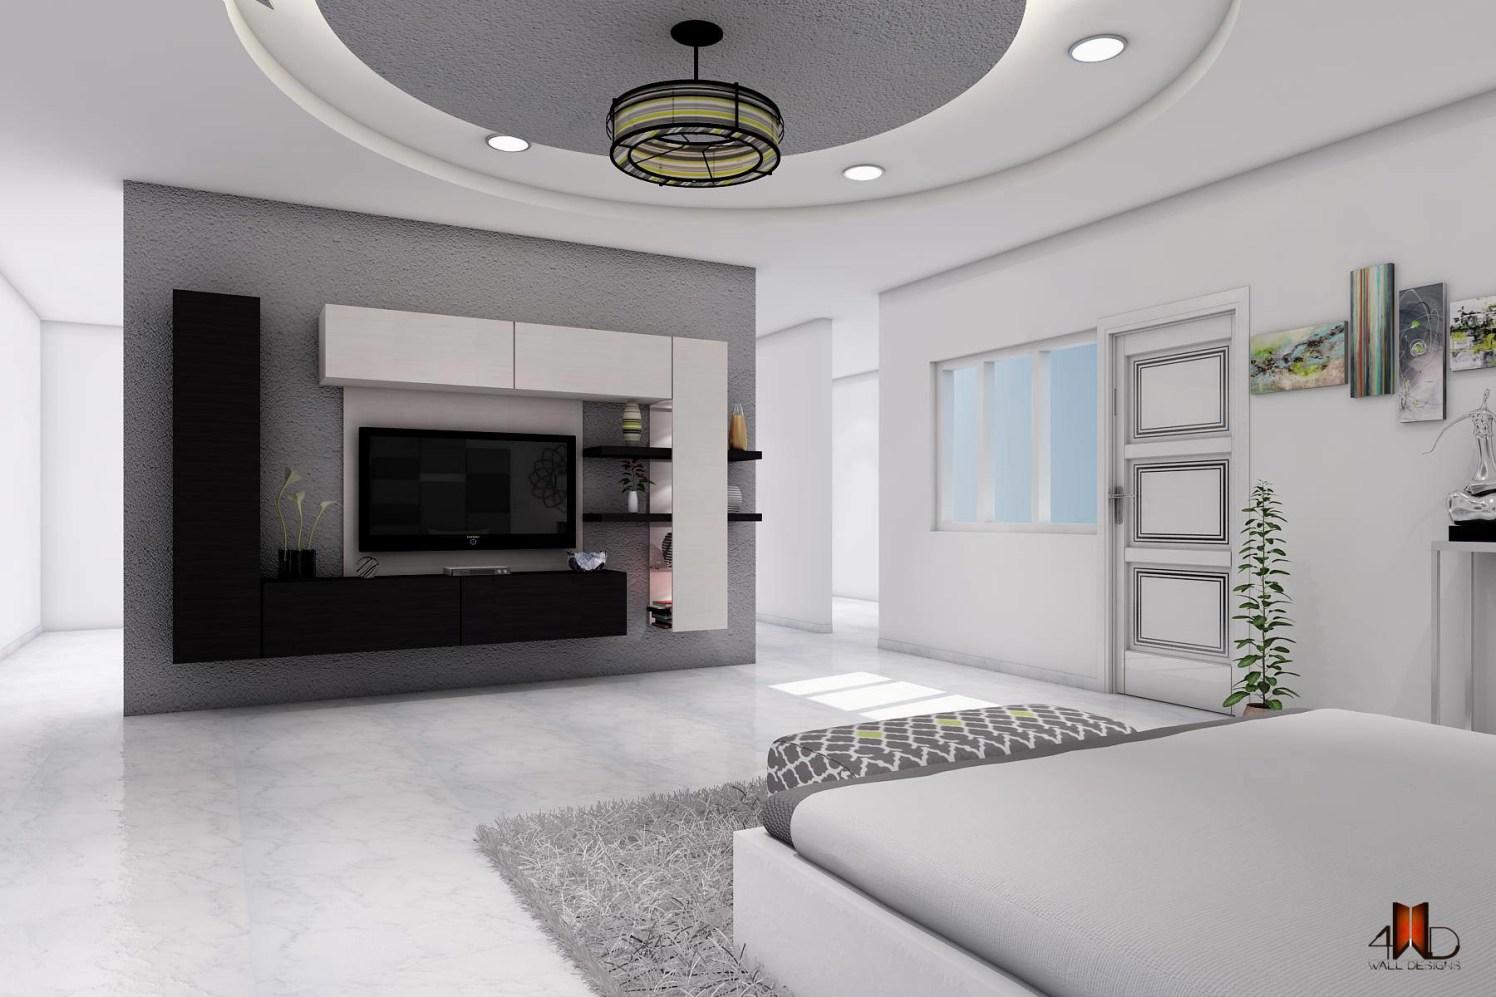 Yin & Yang Symphony by Wall Designs Contemporary | Interior Design Photos & Ideas